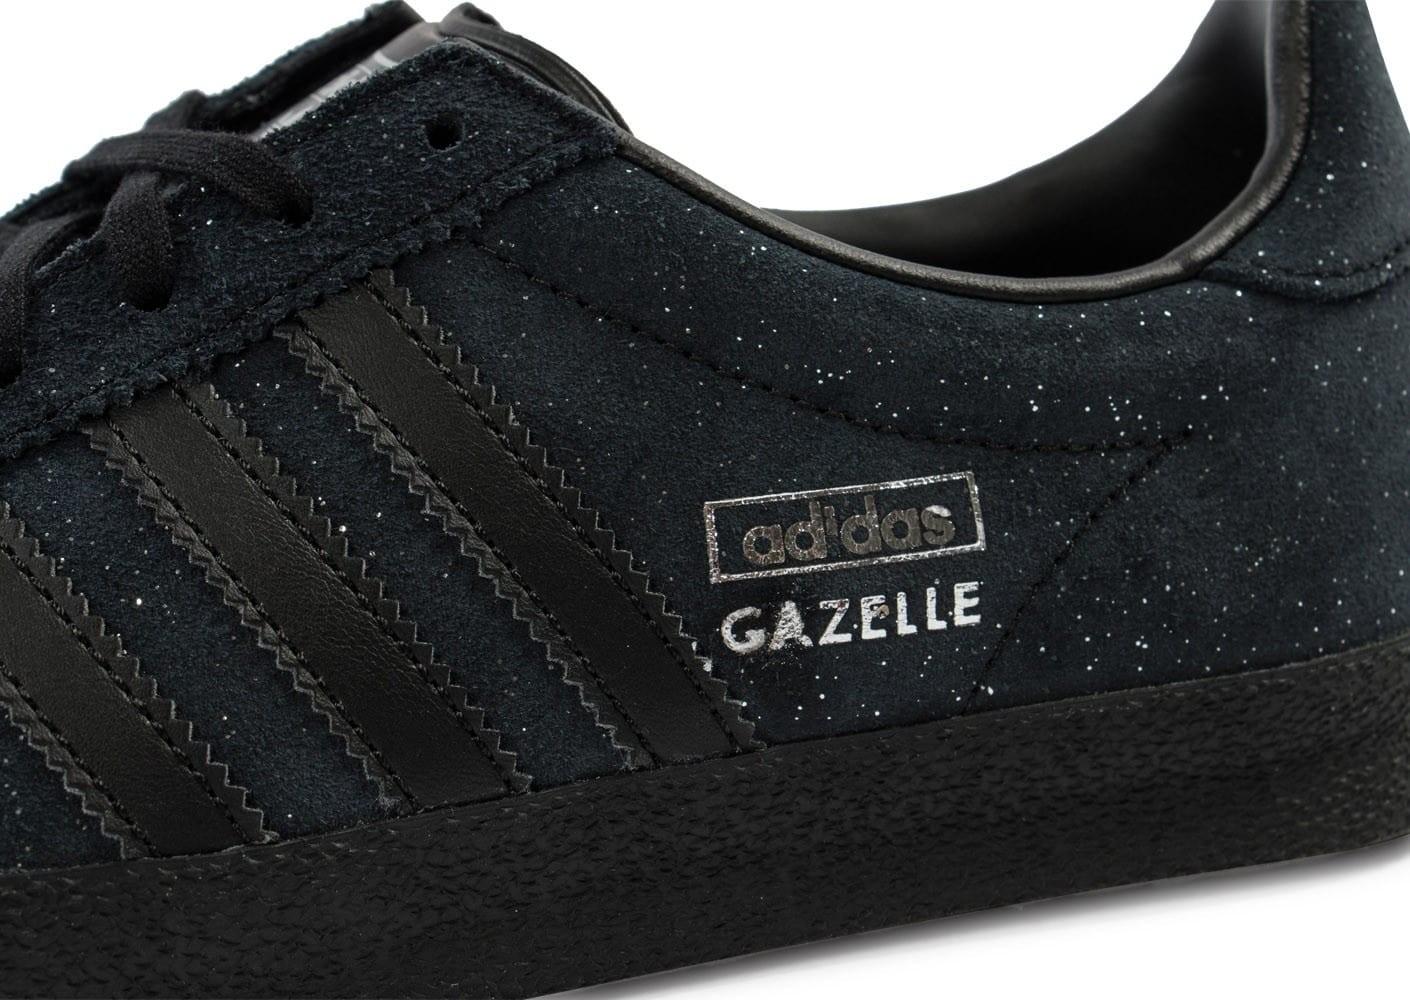 عذاب حدود للغاية adidas gazelle noir paillette - scottygmaster.com